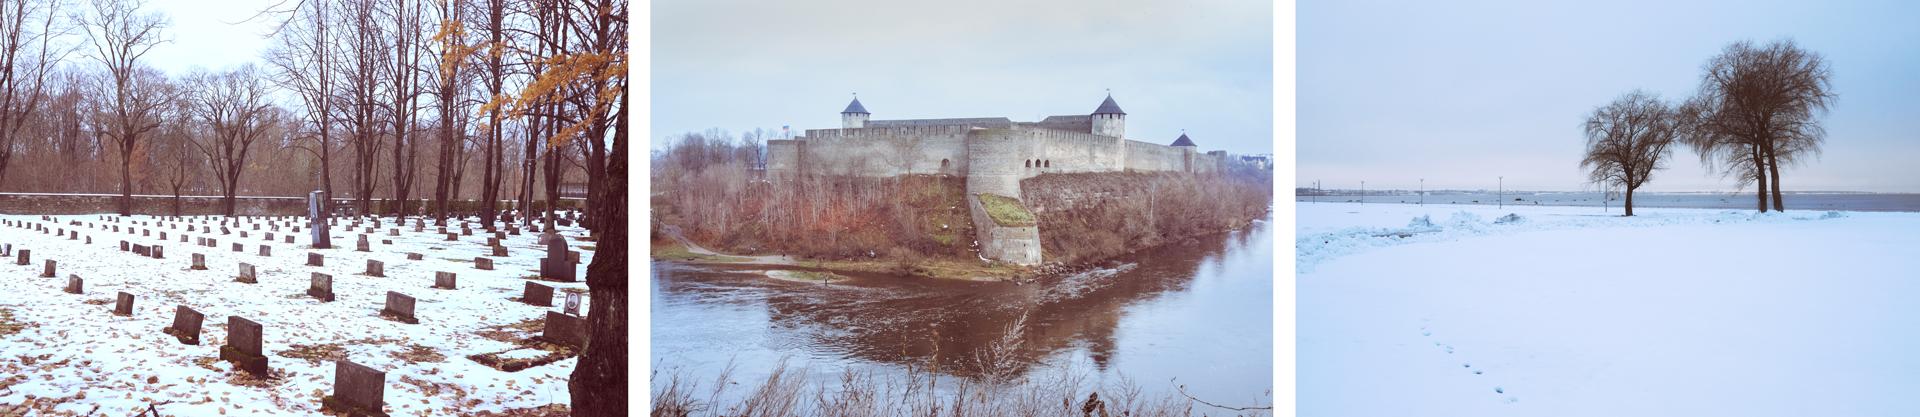 Cementerio soviético/Castillo de Narva/Árbol Pirita.